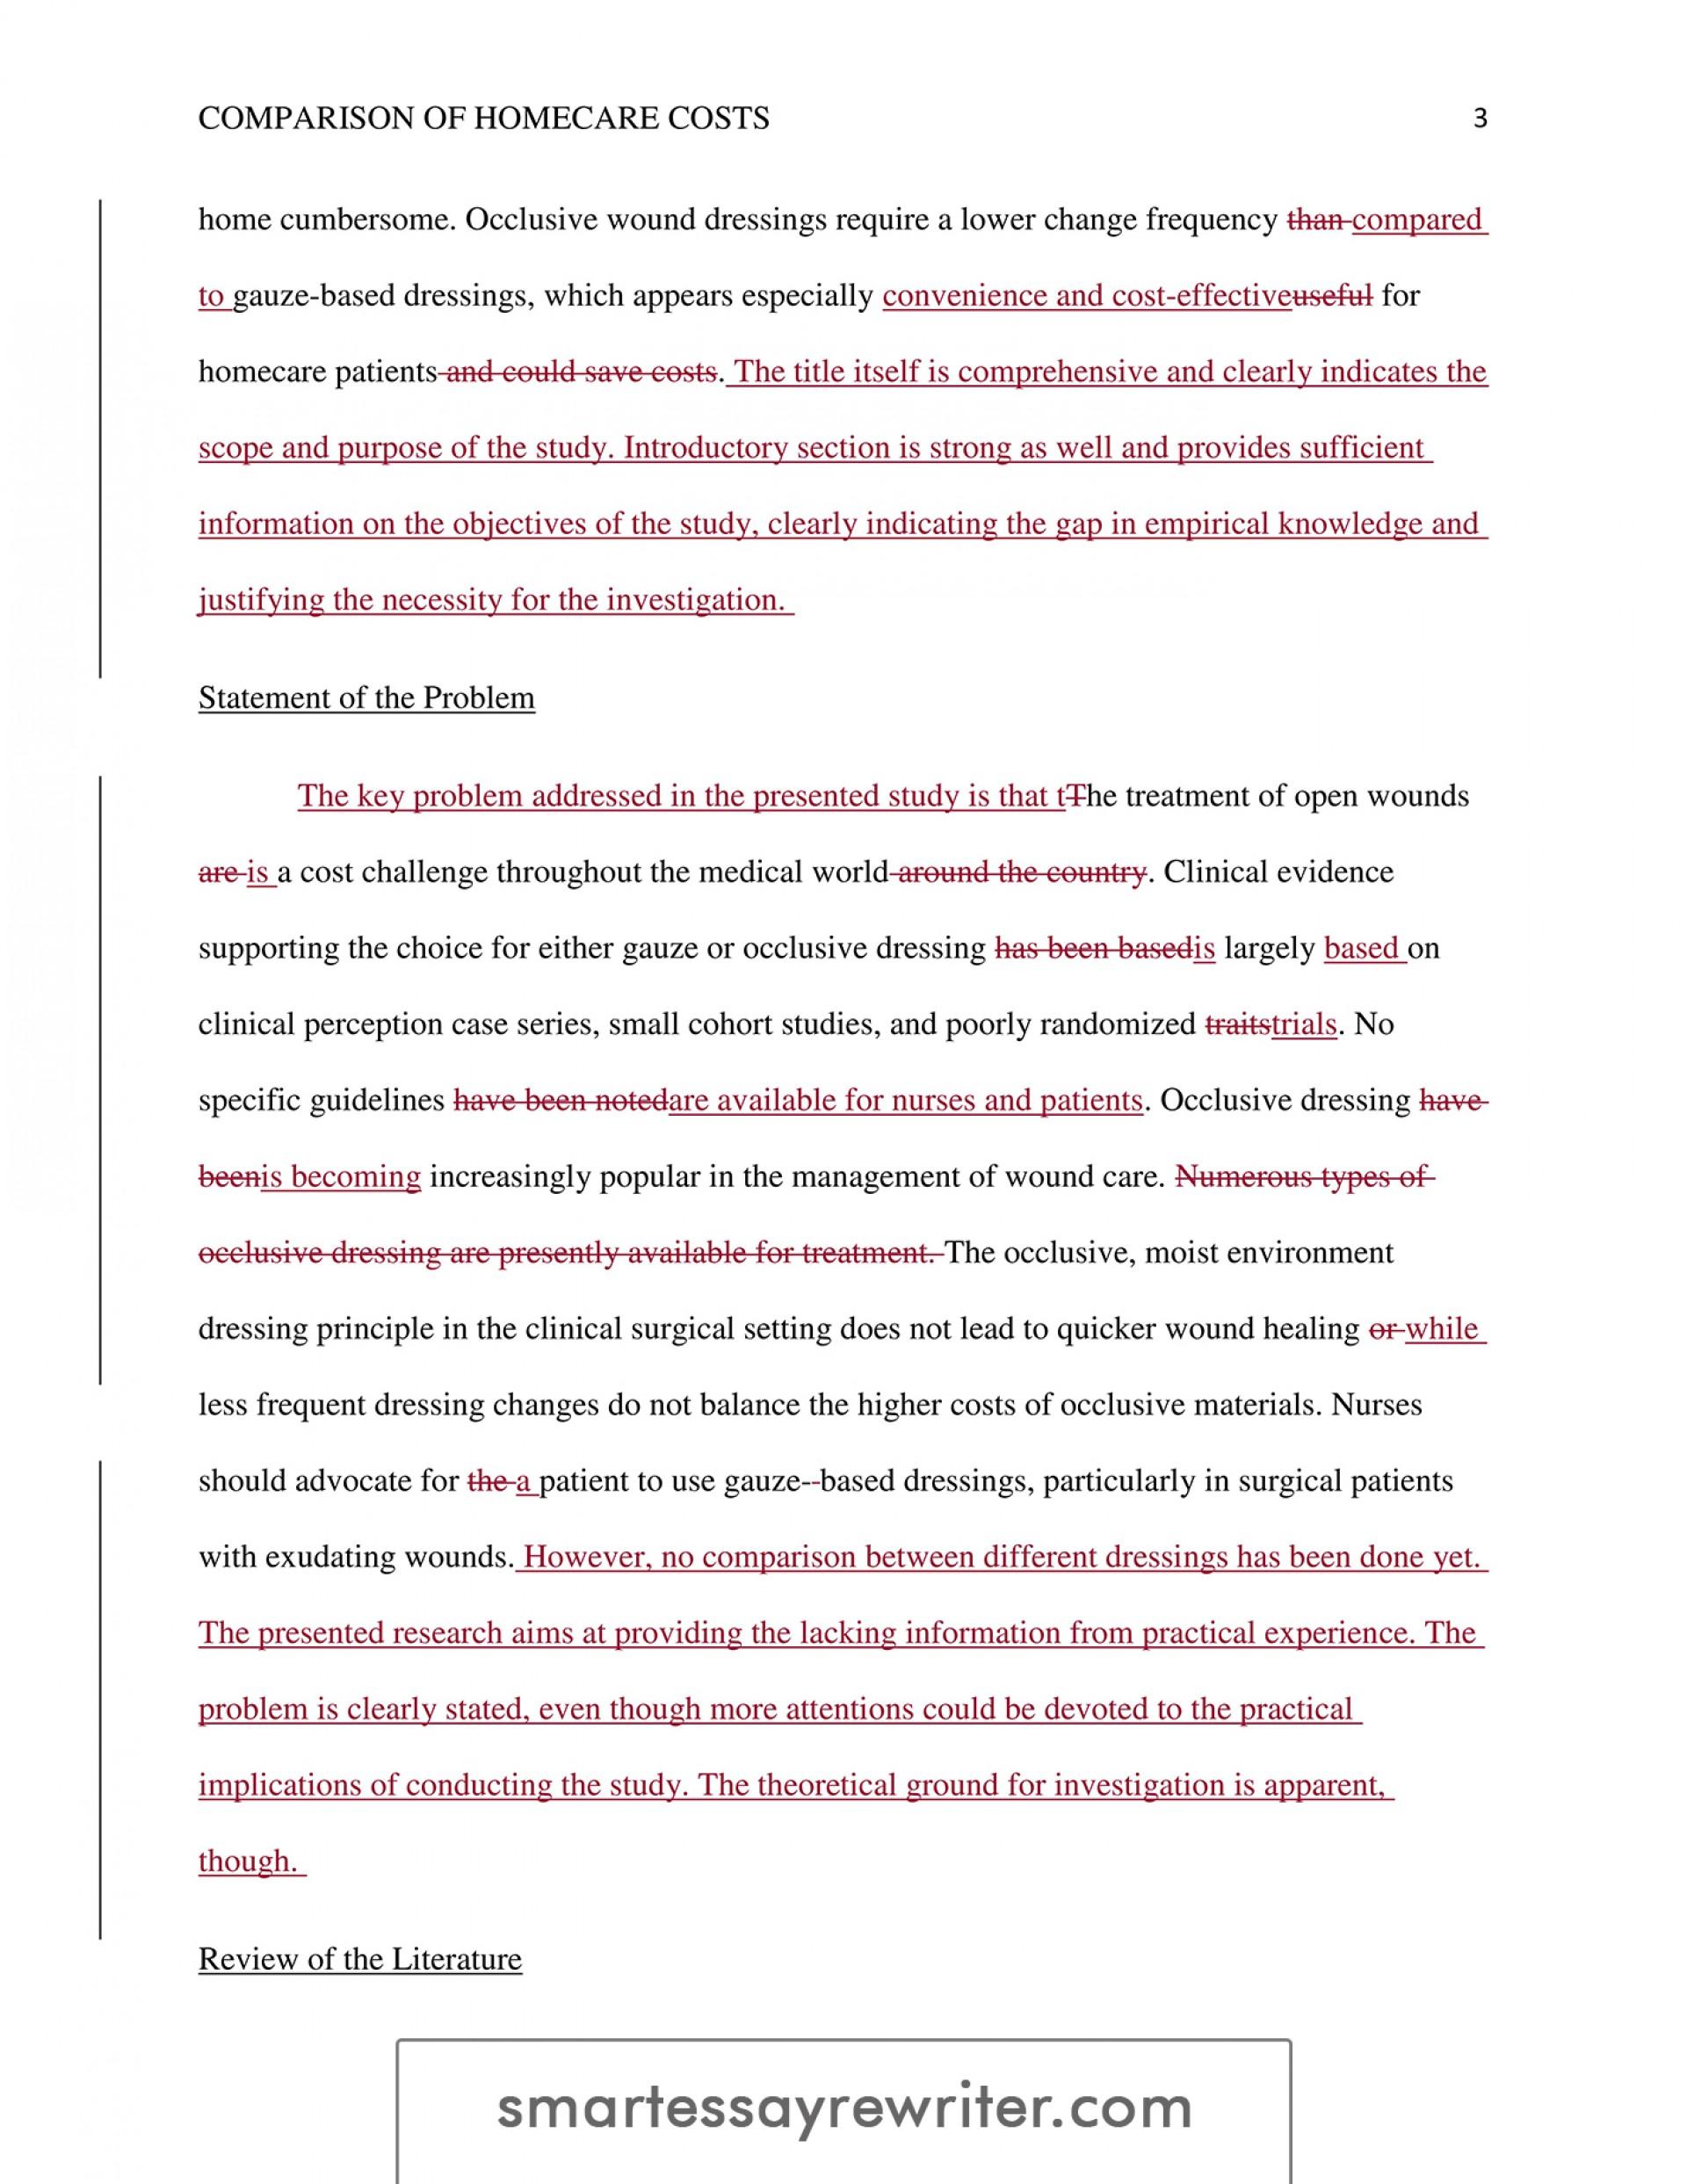 007 Essay Example Rewriter Smartessayrewriter Com Singular Free Software Crack Generator 1920